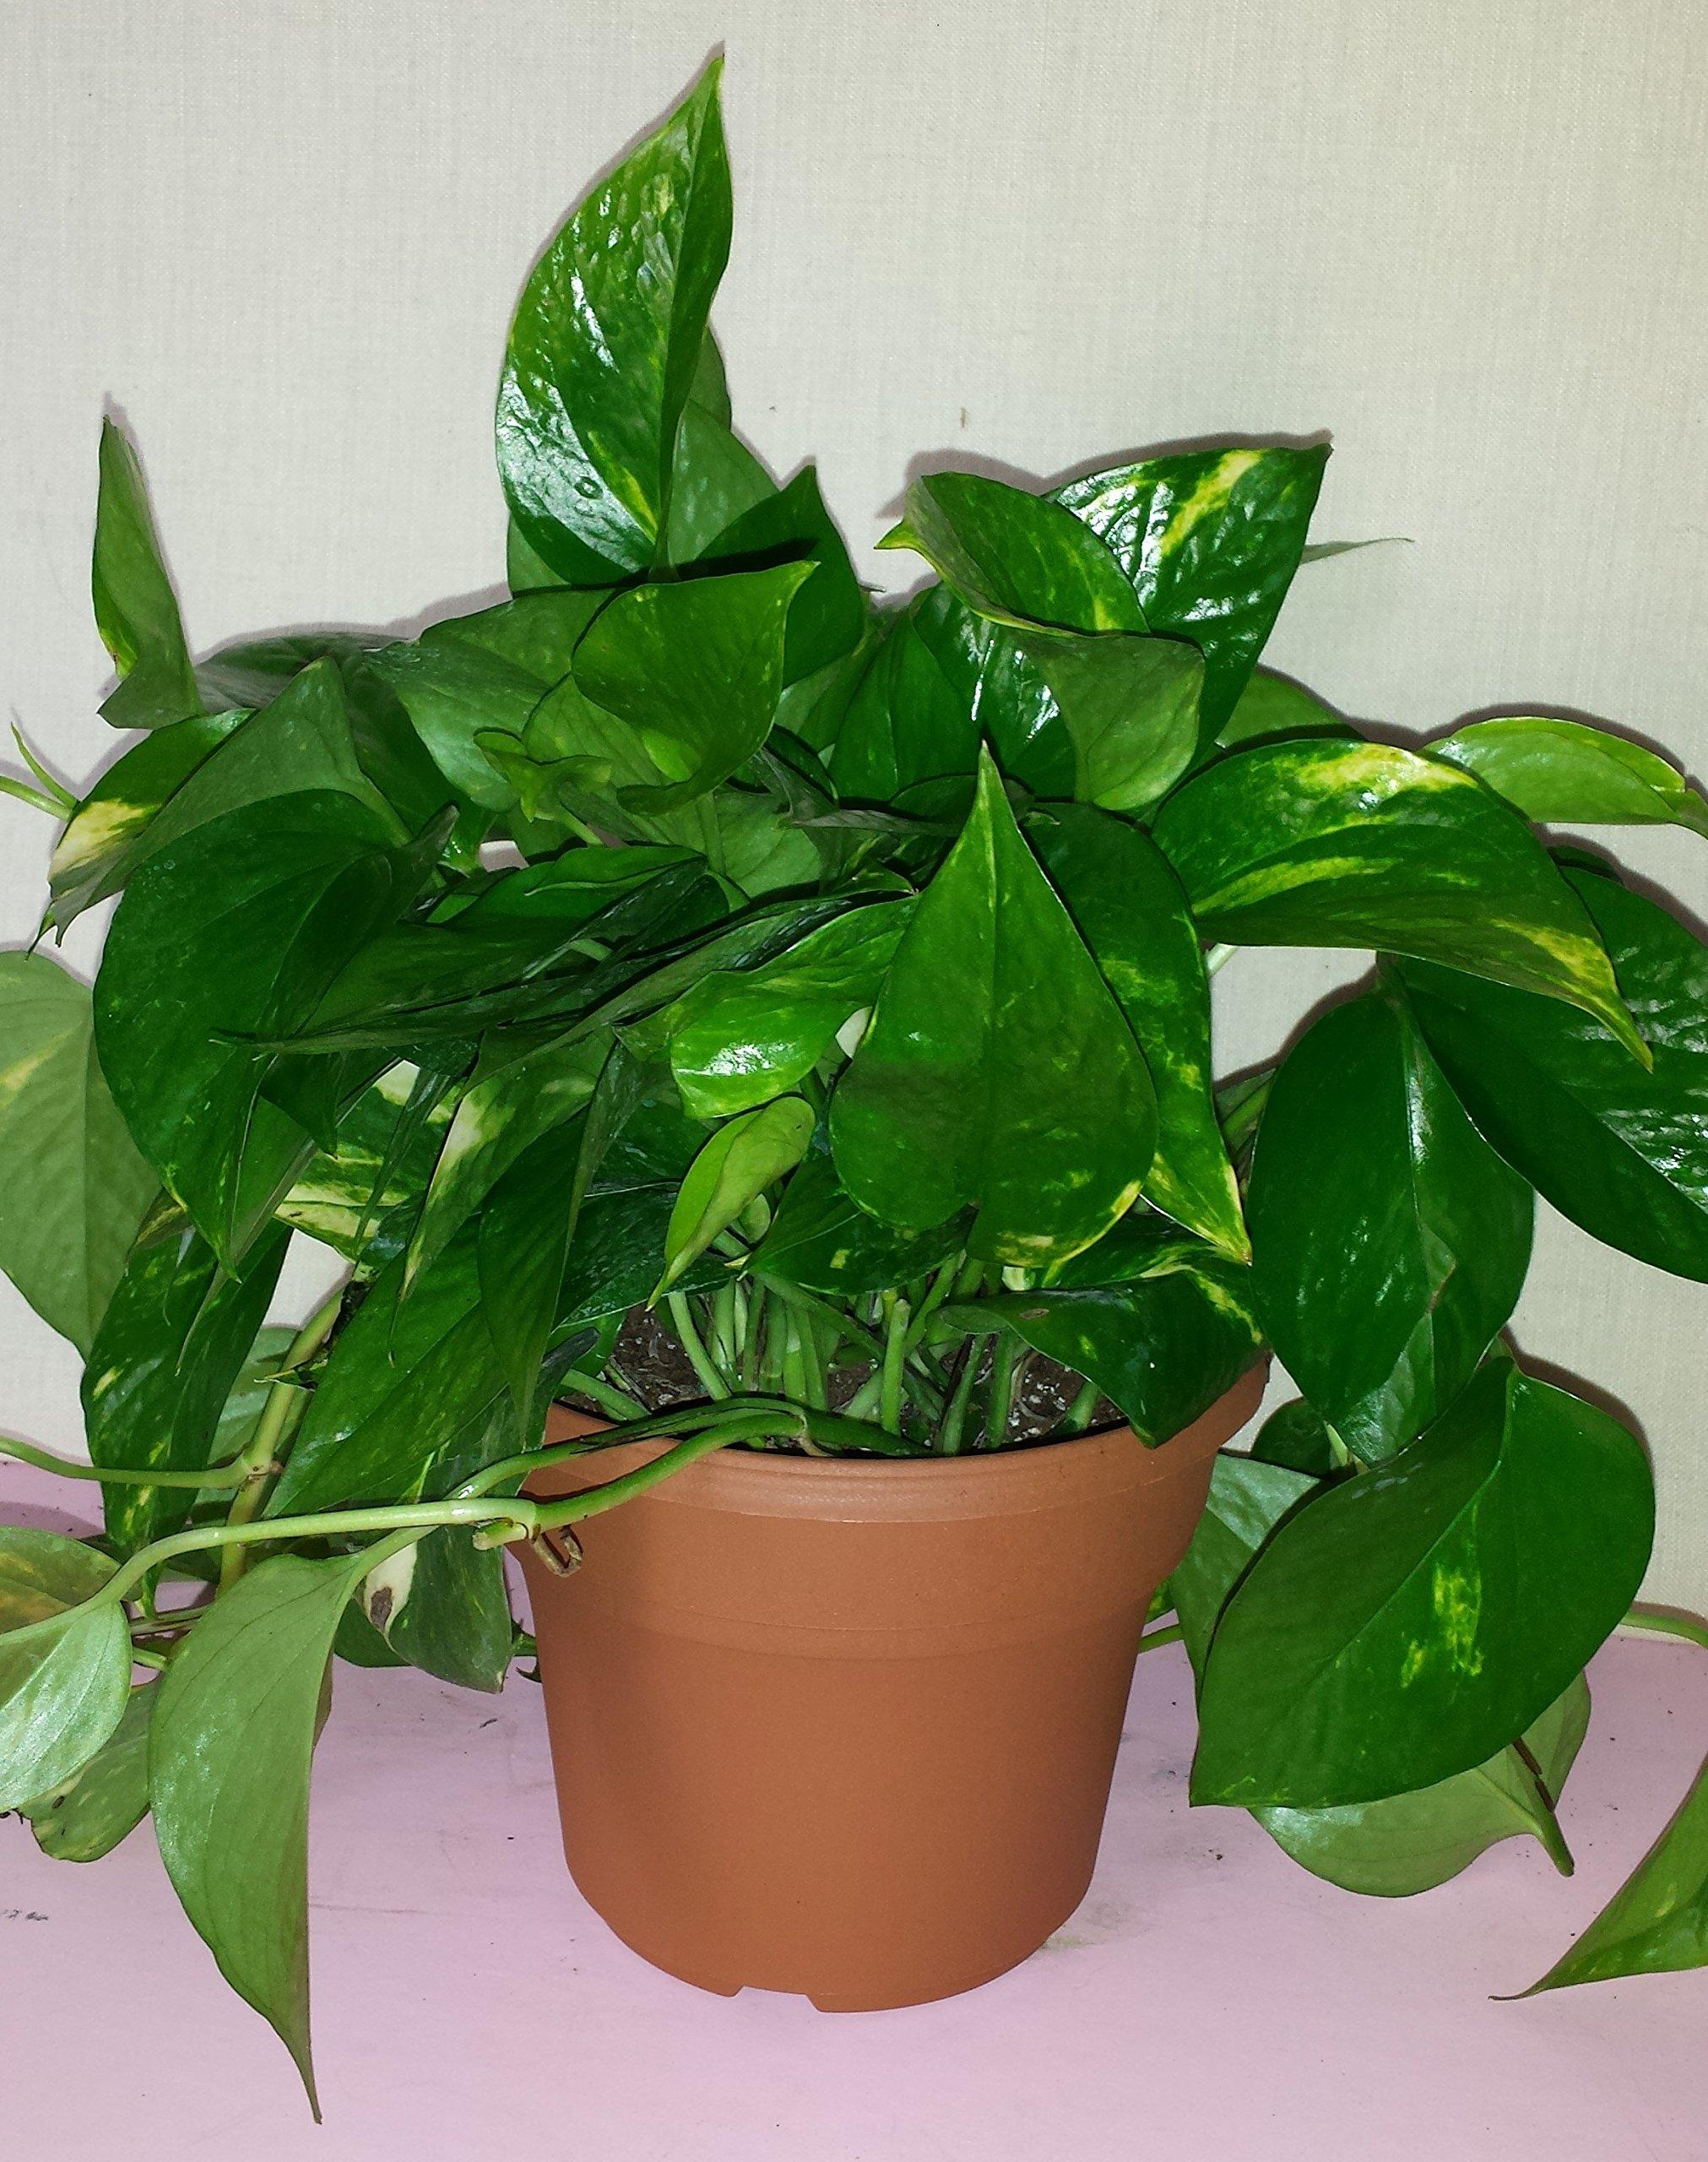 Golden Pothos Plant in a Six Inch Decorative Pot with Free Organic Fertilizer